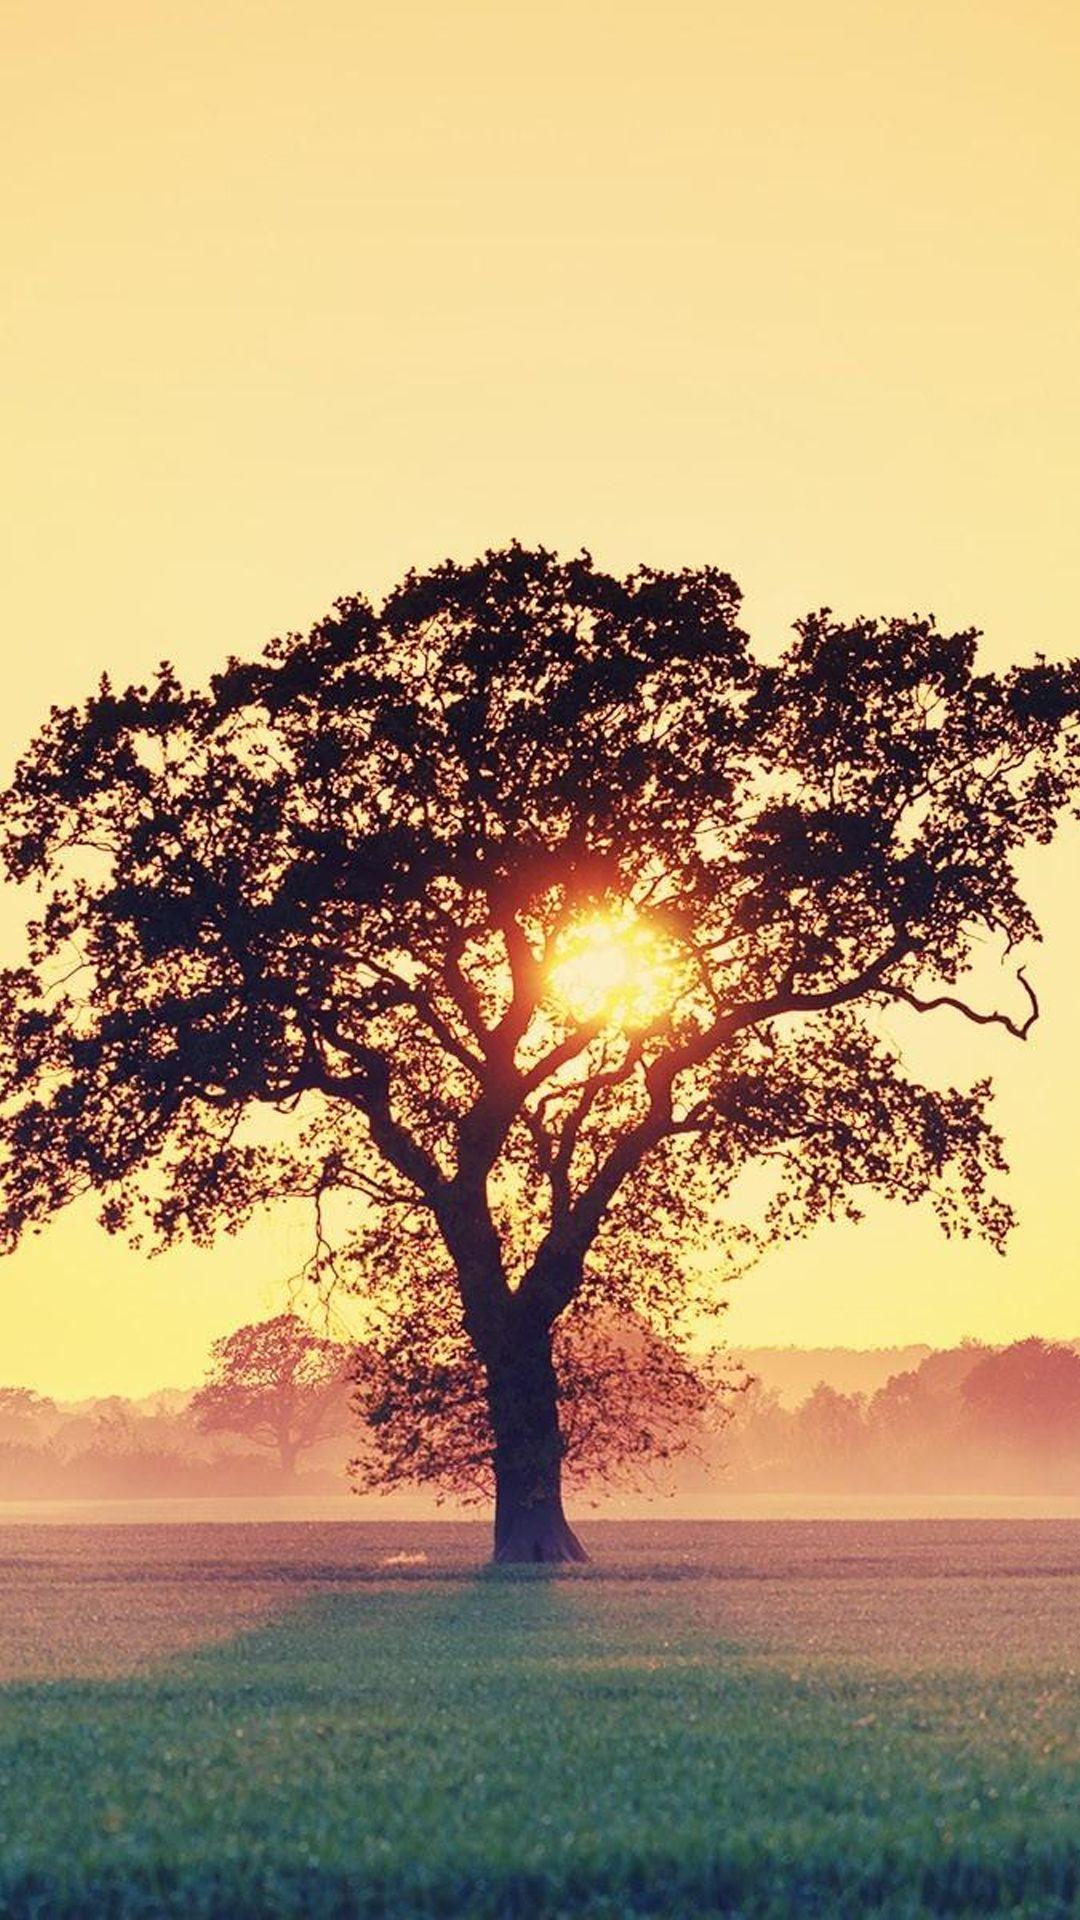 Countryside Tree Sunset iPhone 6 wallpaper Sunset